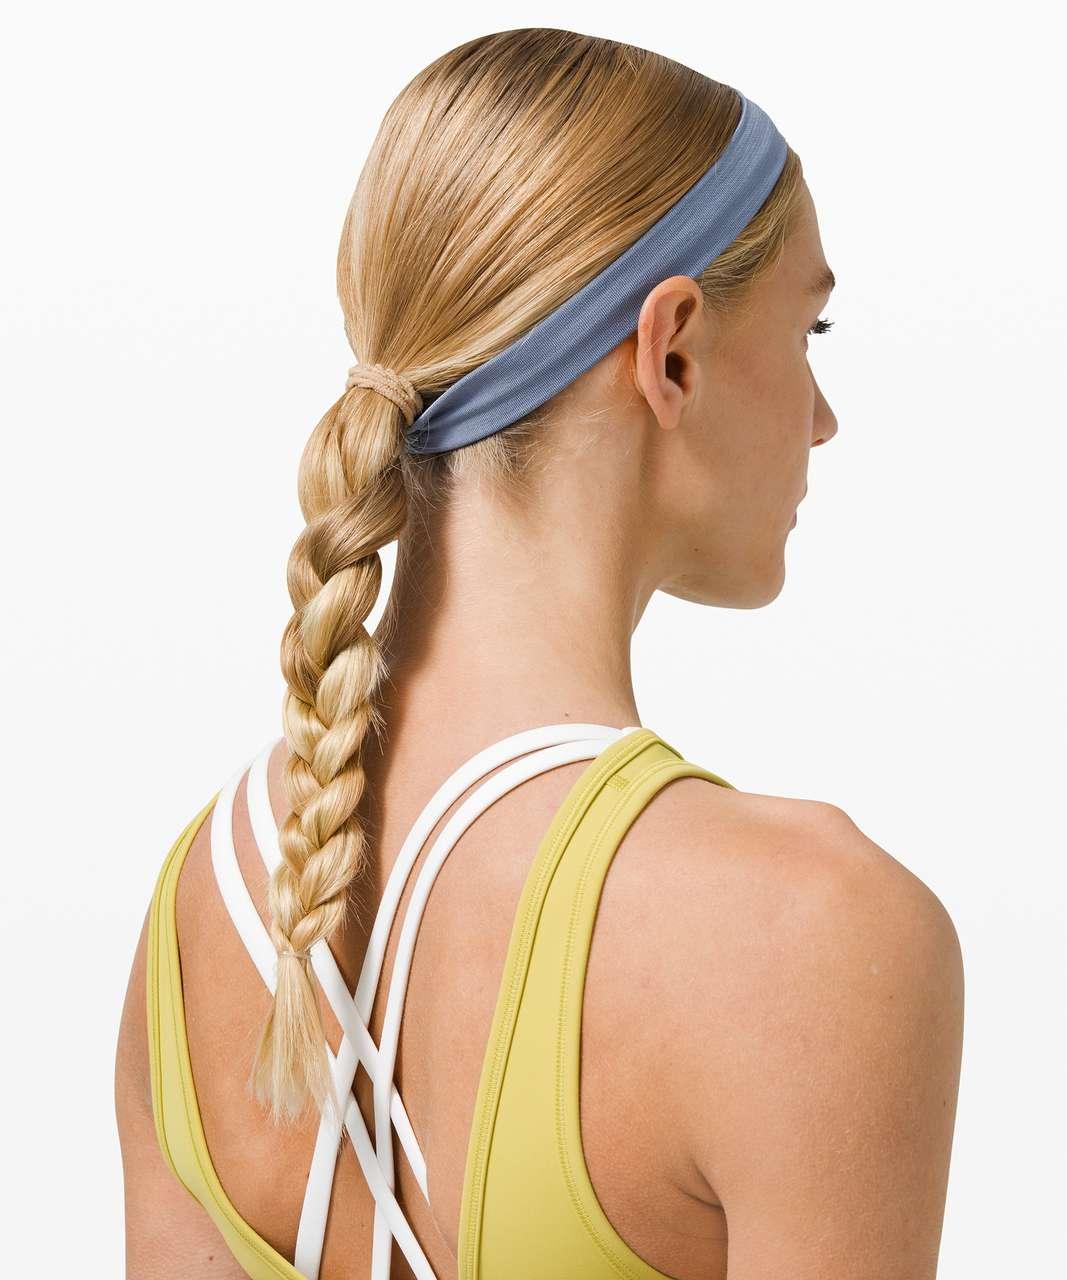 Lululemon Cardio Cross Trainer Headband - Heathered Water Drop